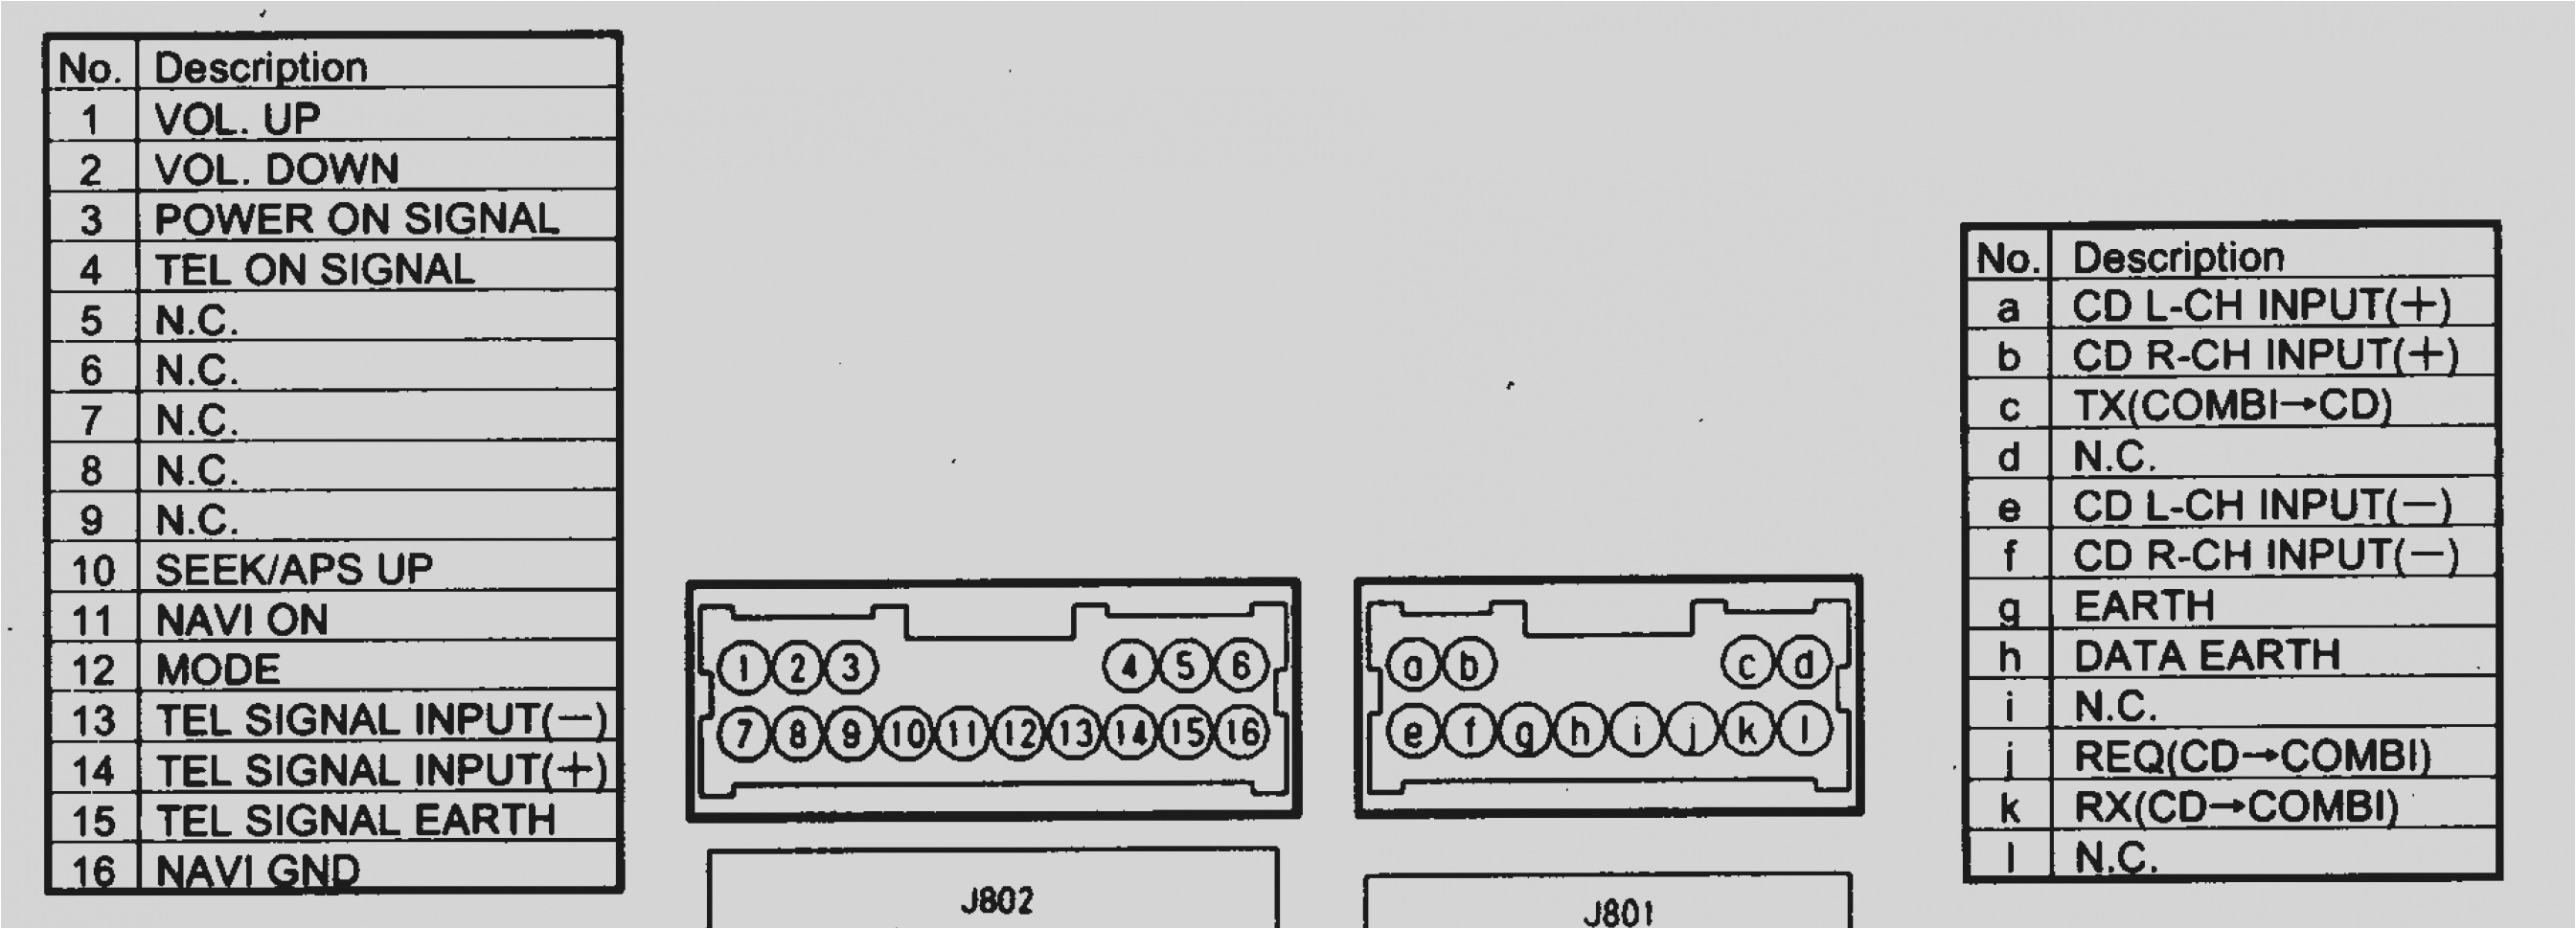 nissan radio wiring harness diagram wiring diagram blog nissan wire harness diagram source 2001 nissan frontier